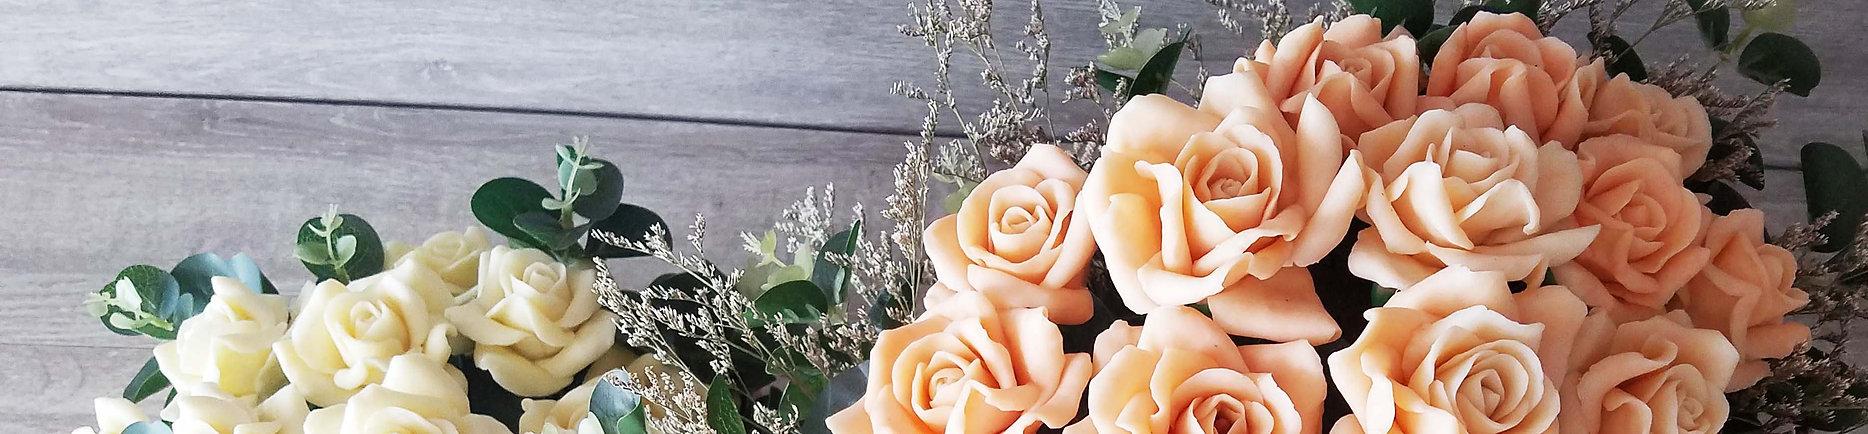 soap roses hebes 2.jpg